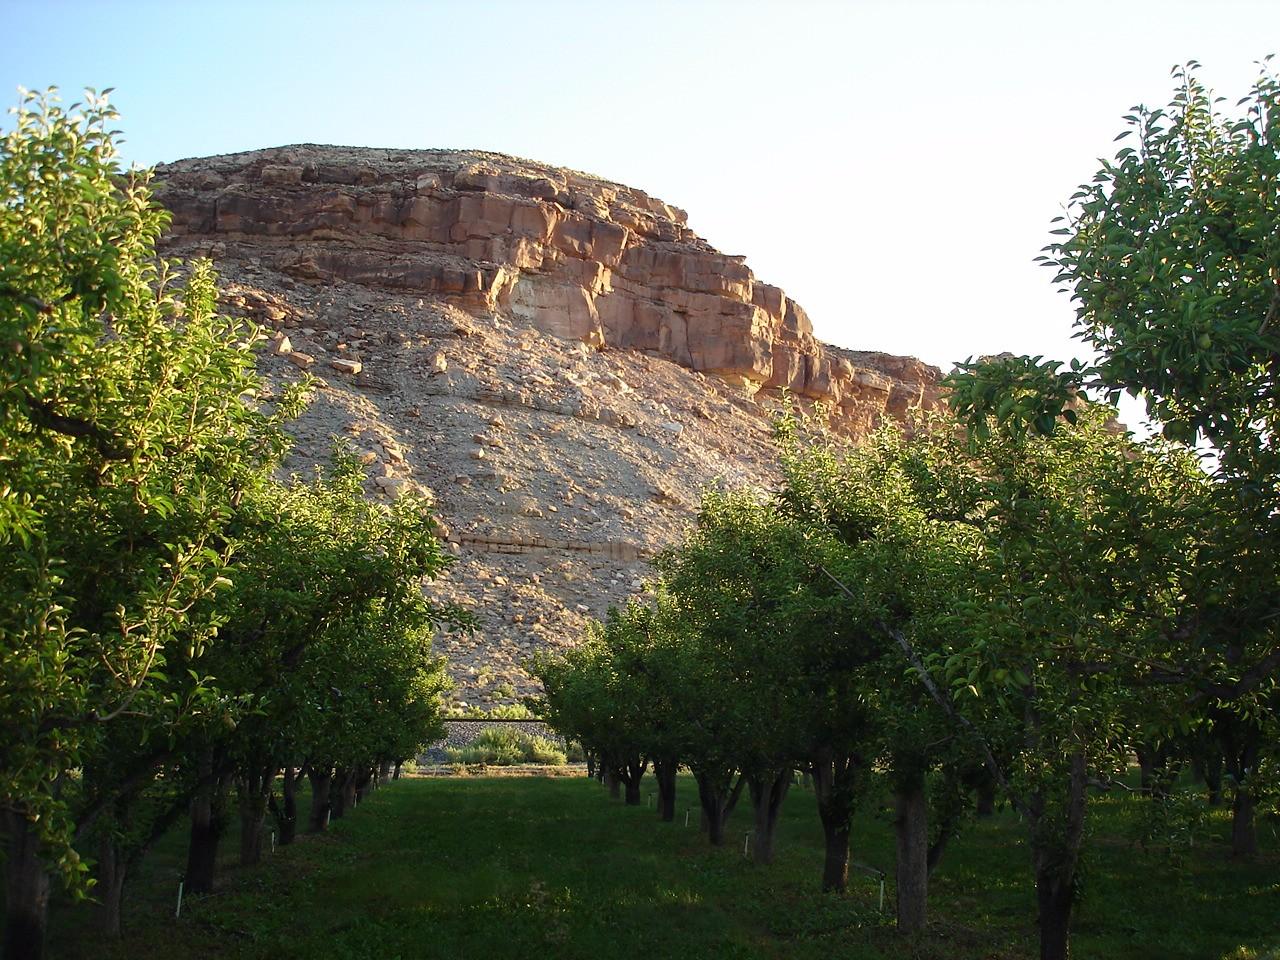 16.pears